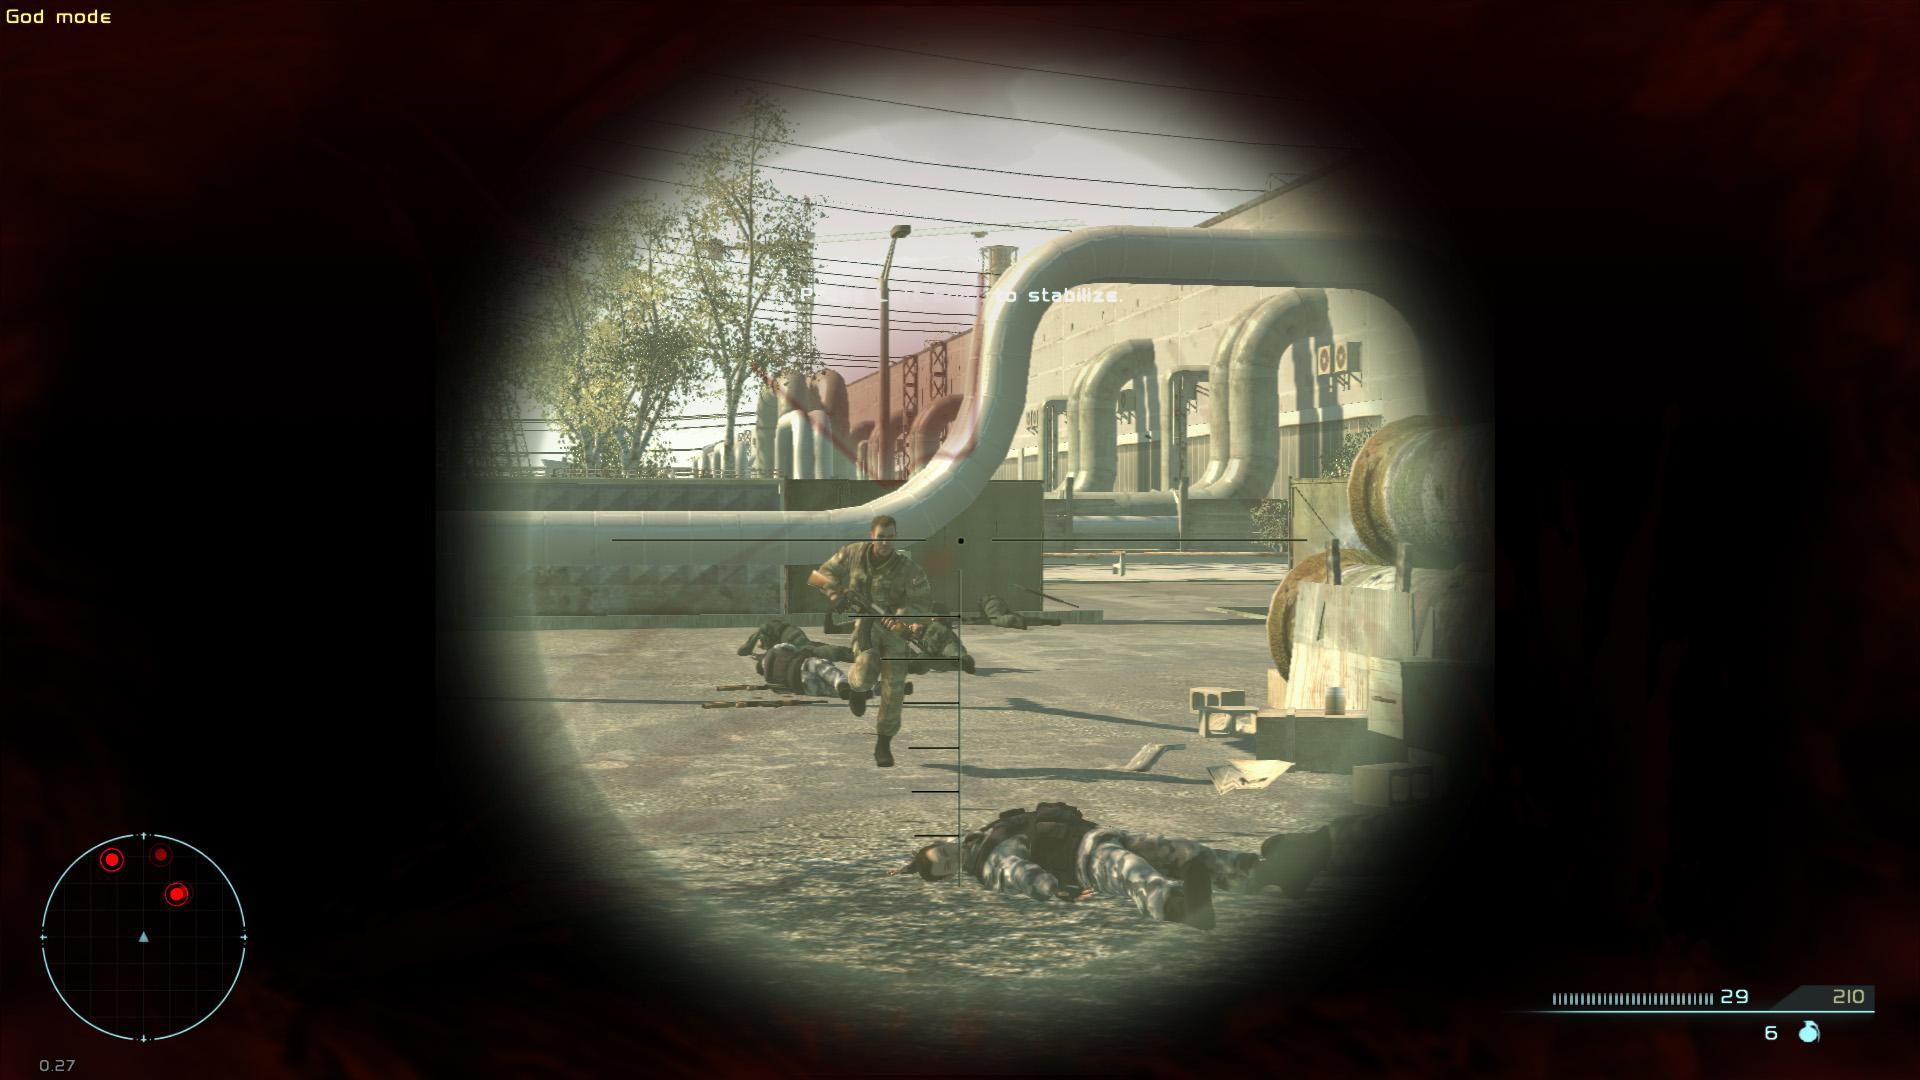 http://media.moddb.com/images/games/1/21/20754/scr09.jpg